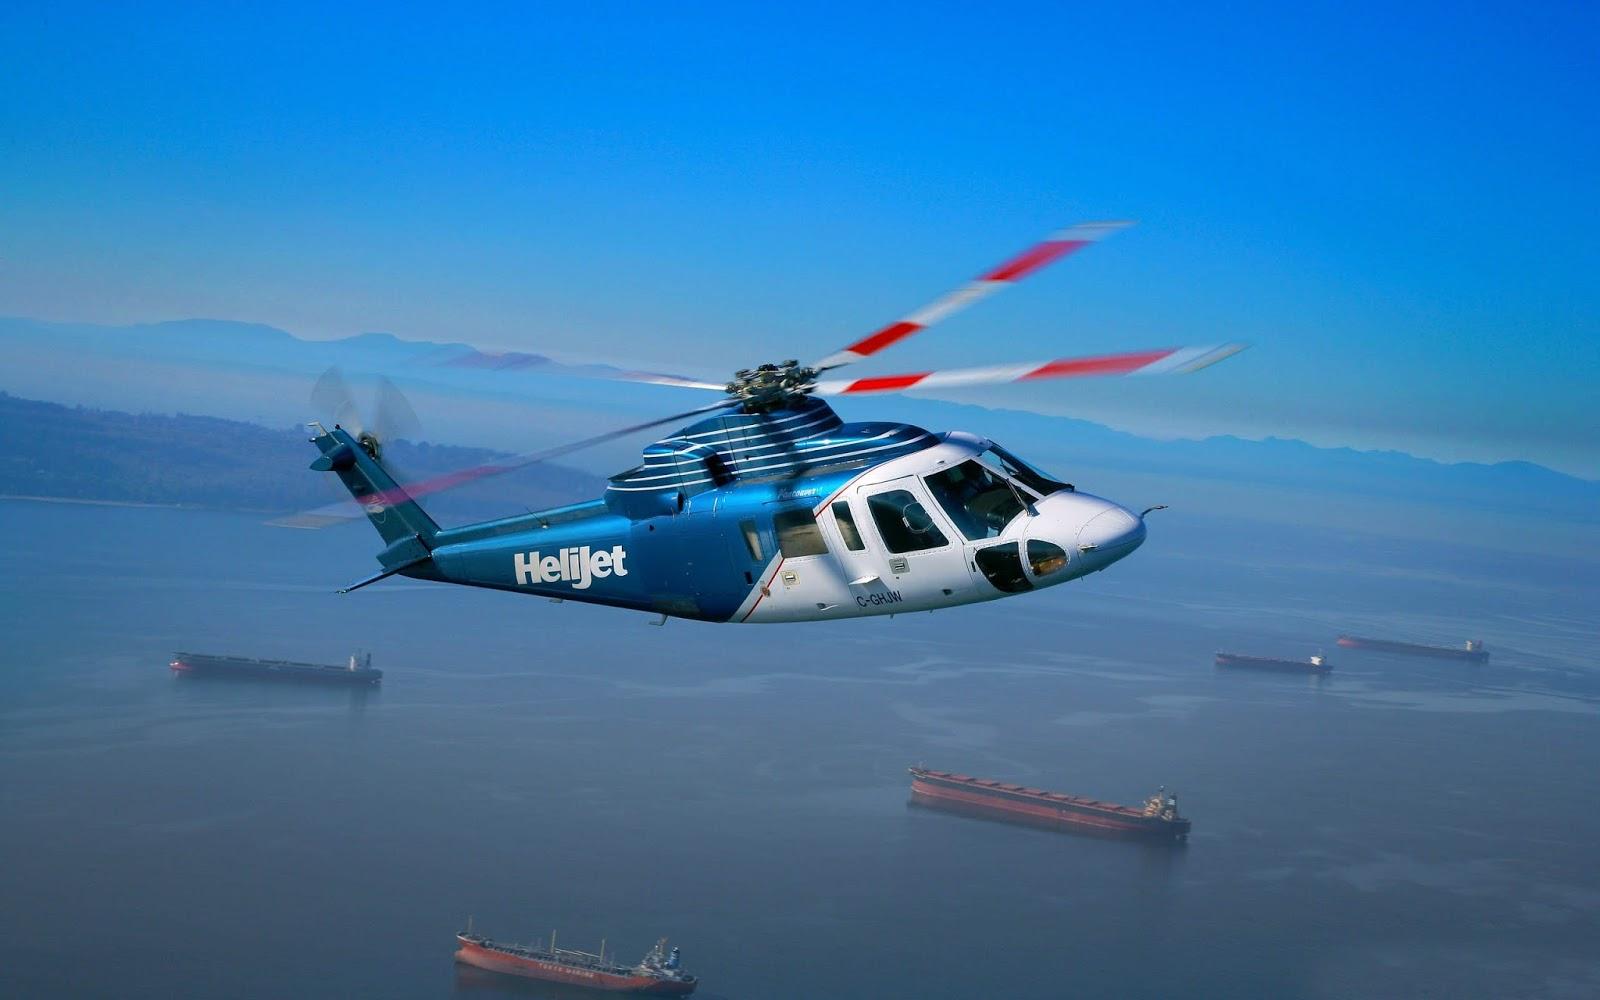 helicopter wallpaper hd desktop - photo #4